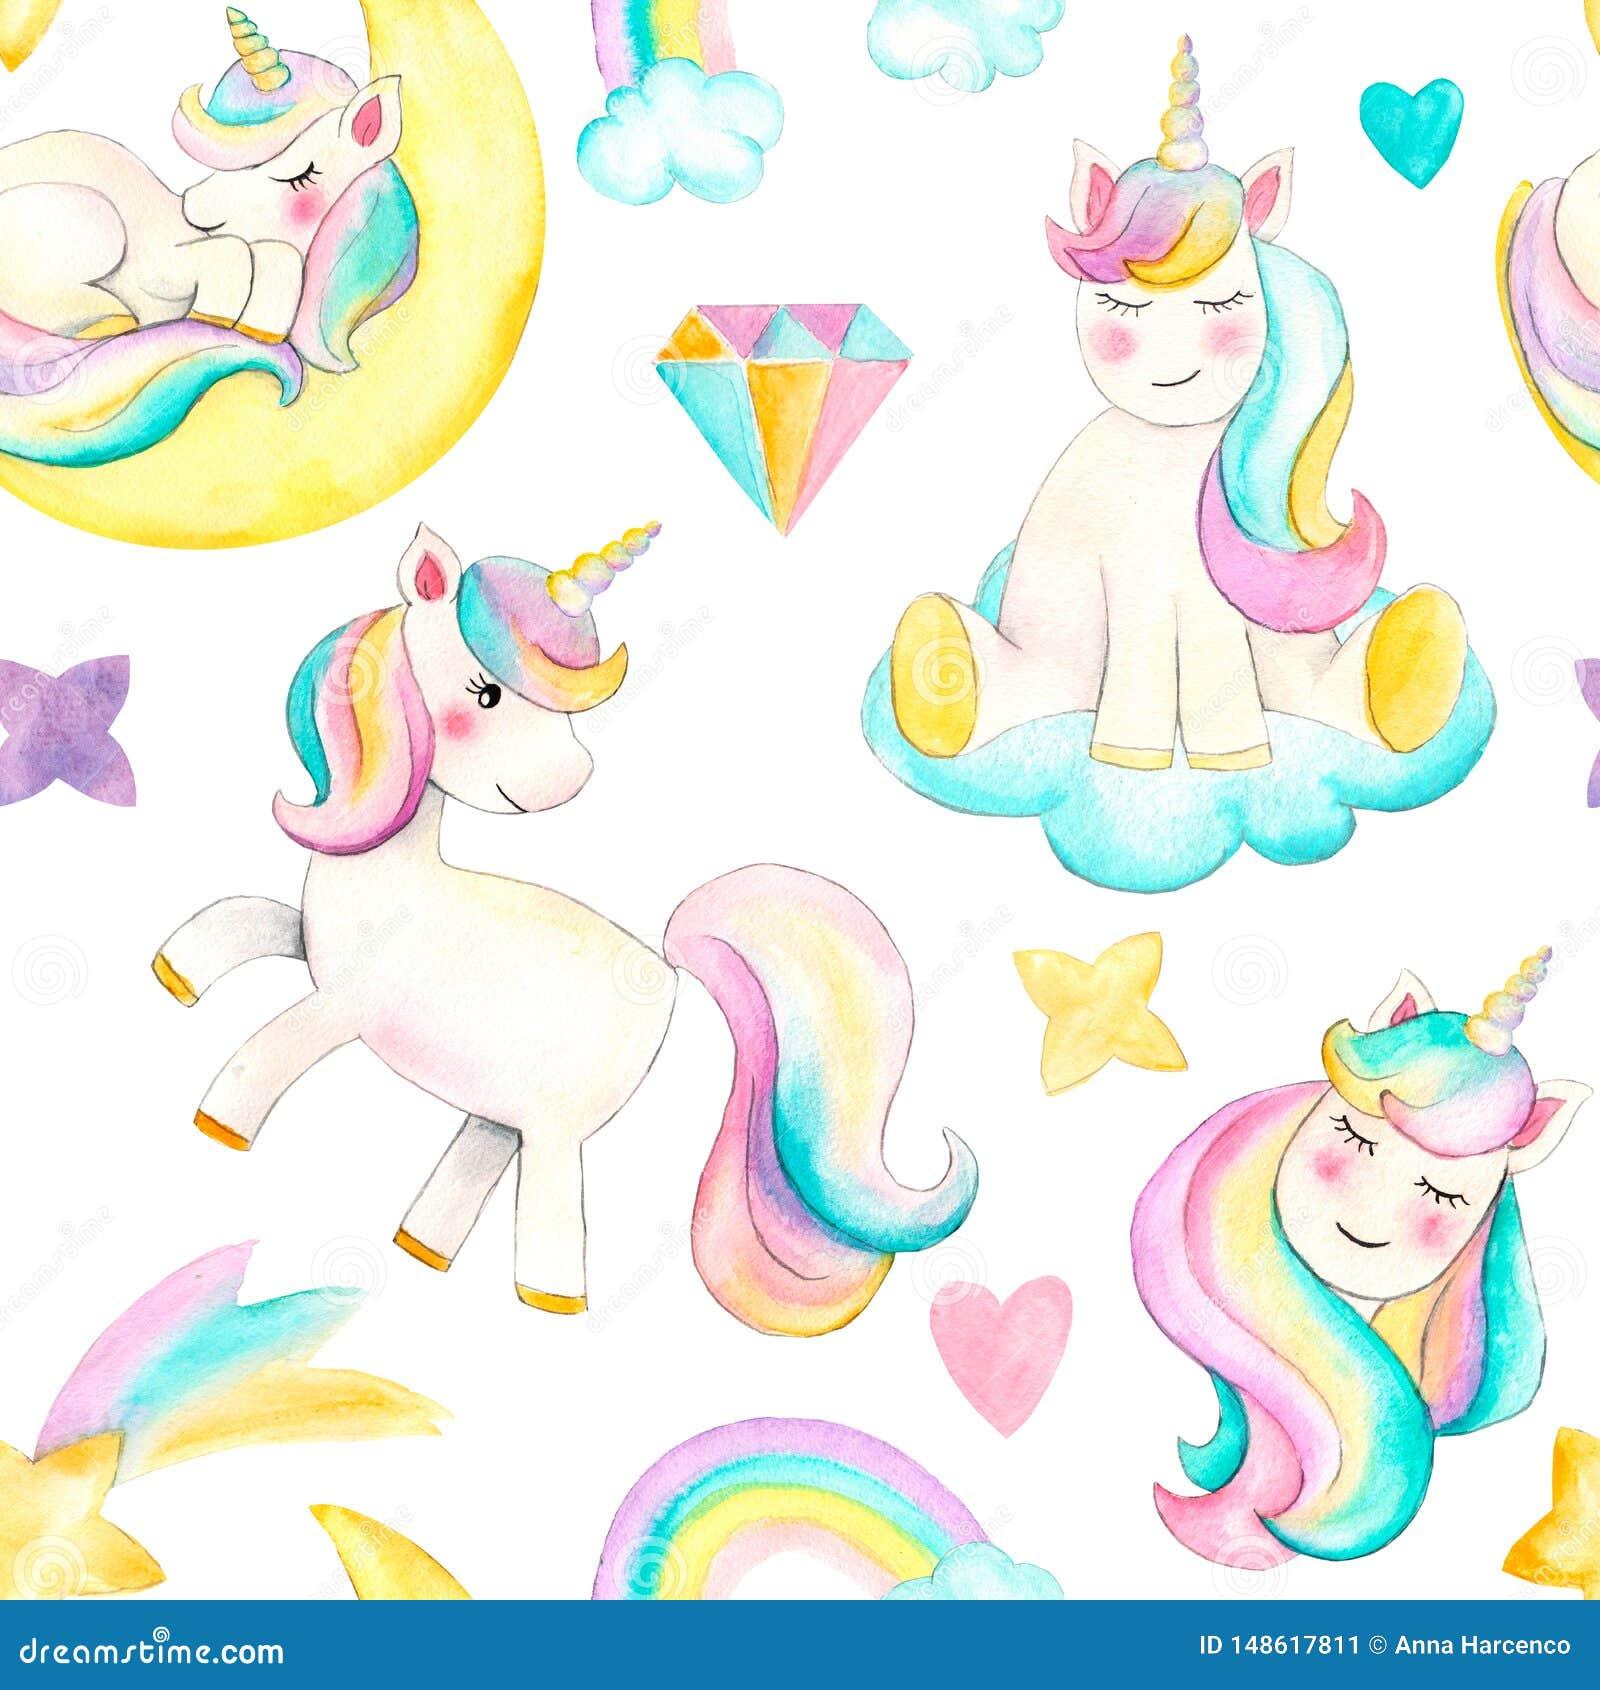 Seamless pattern with unicorns. Beautiful watercolor unicorn illustration. Magic trendy cartoon horse perfect for nursery print an